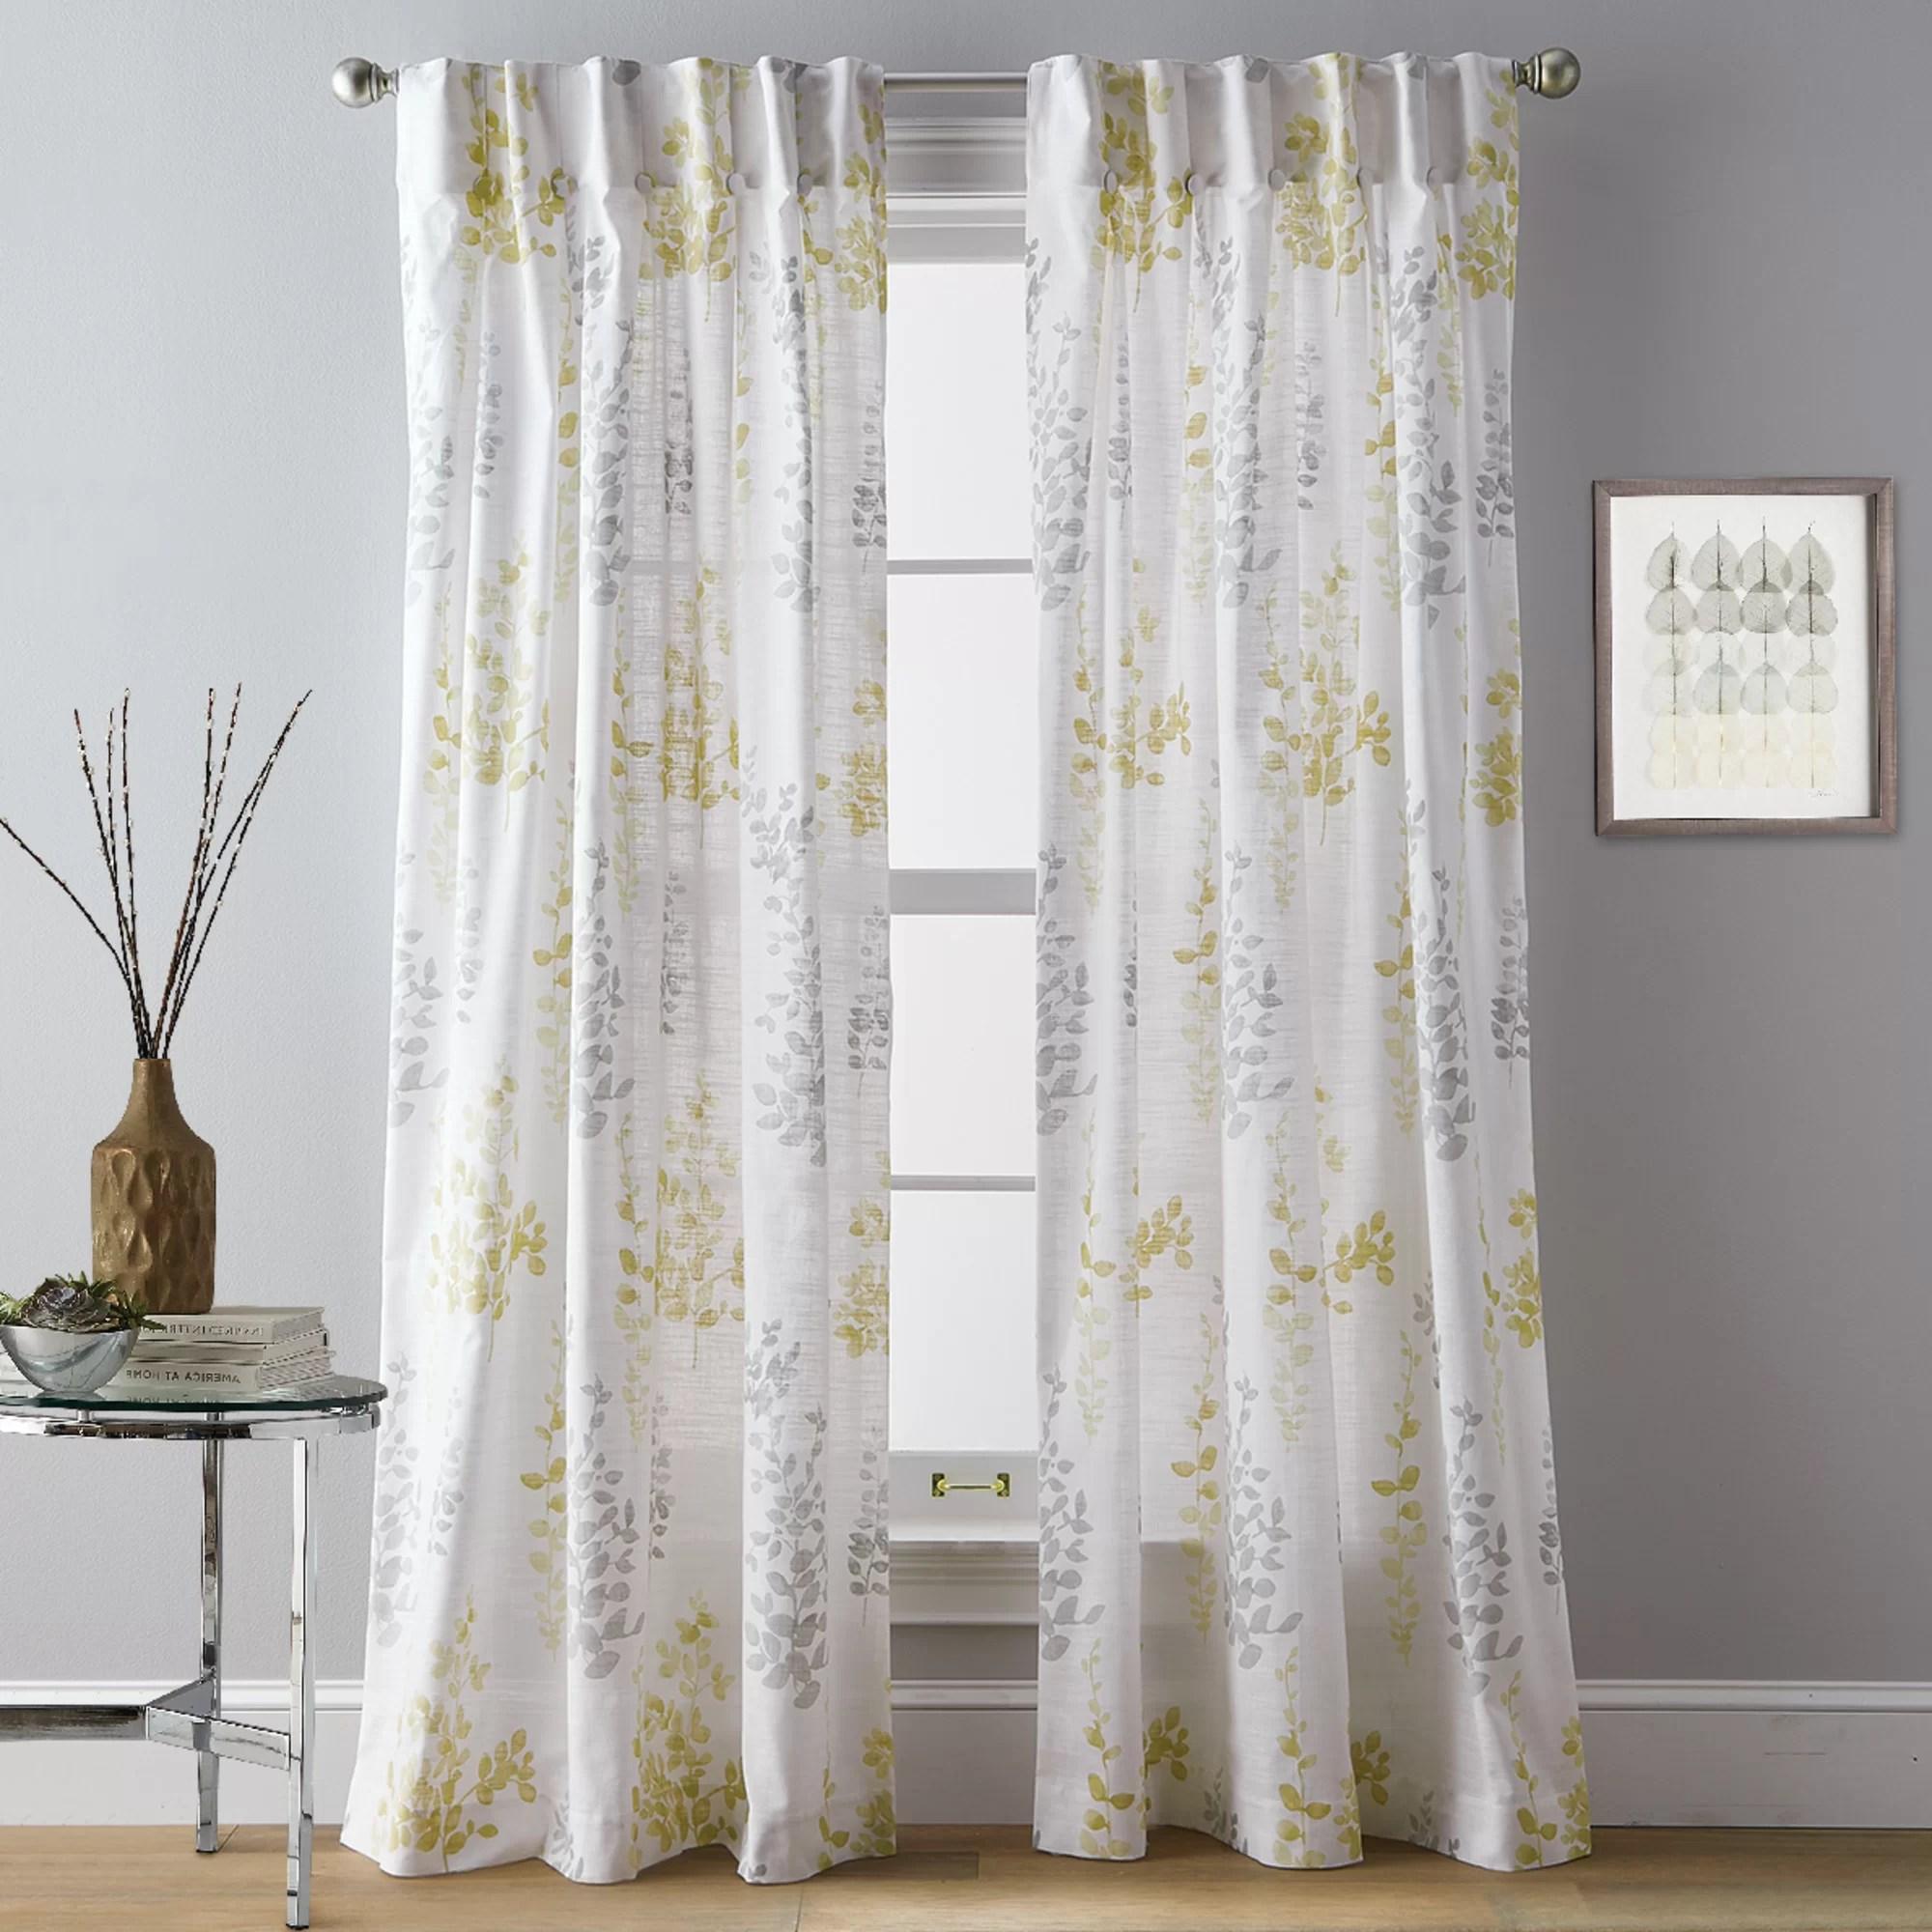 watercolor petunia 100 cotton floral sheer rod pocket curtain panelsel pair